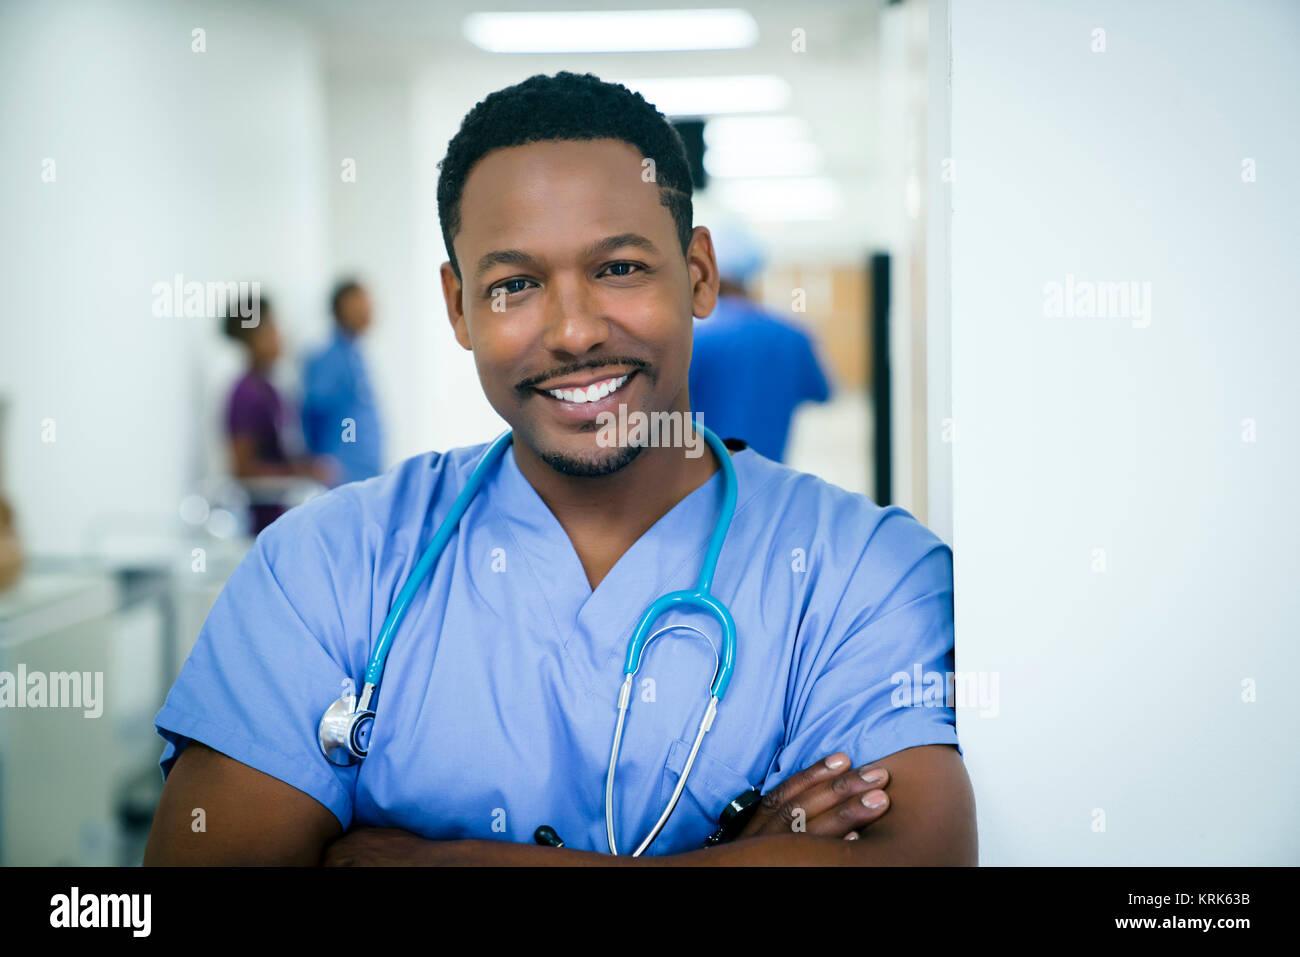 Portrait of smiling black nurse - Stock Image